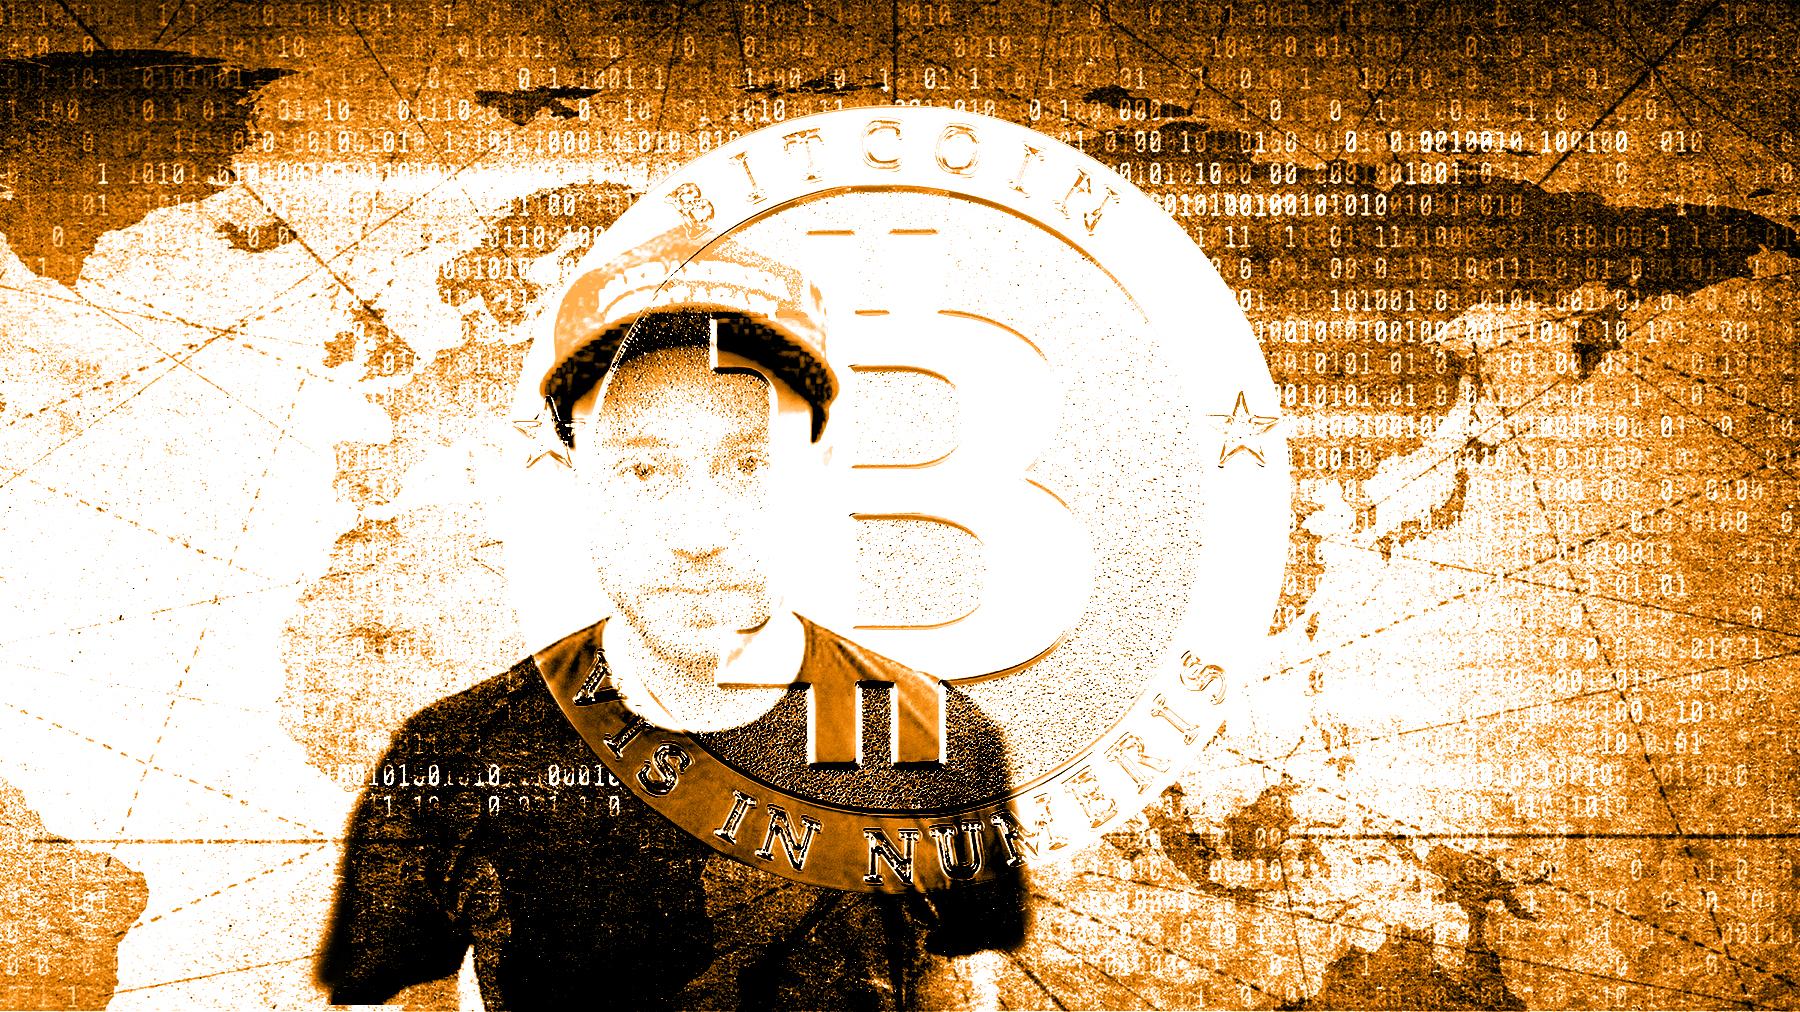 Neo-Nazi's Bitcoin History Suggests Russian Darknet Link